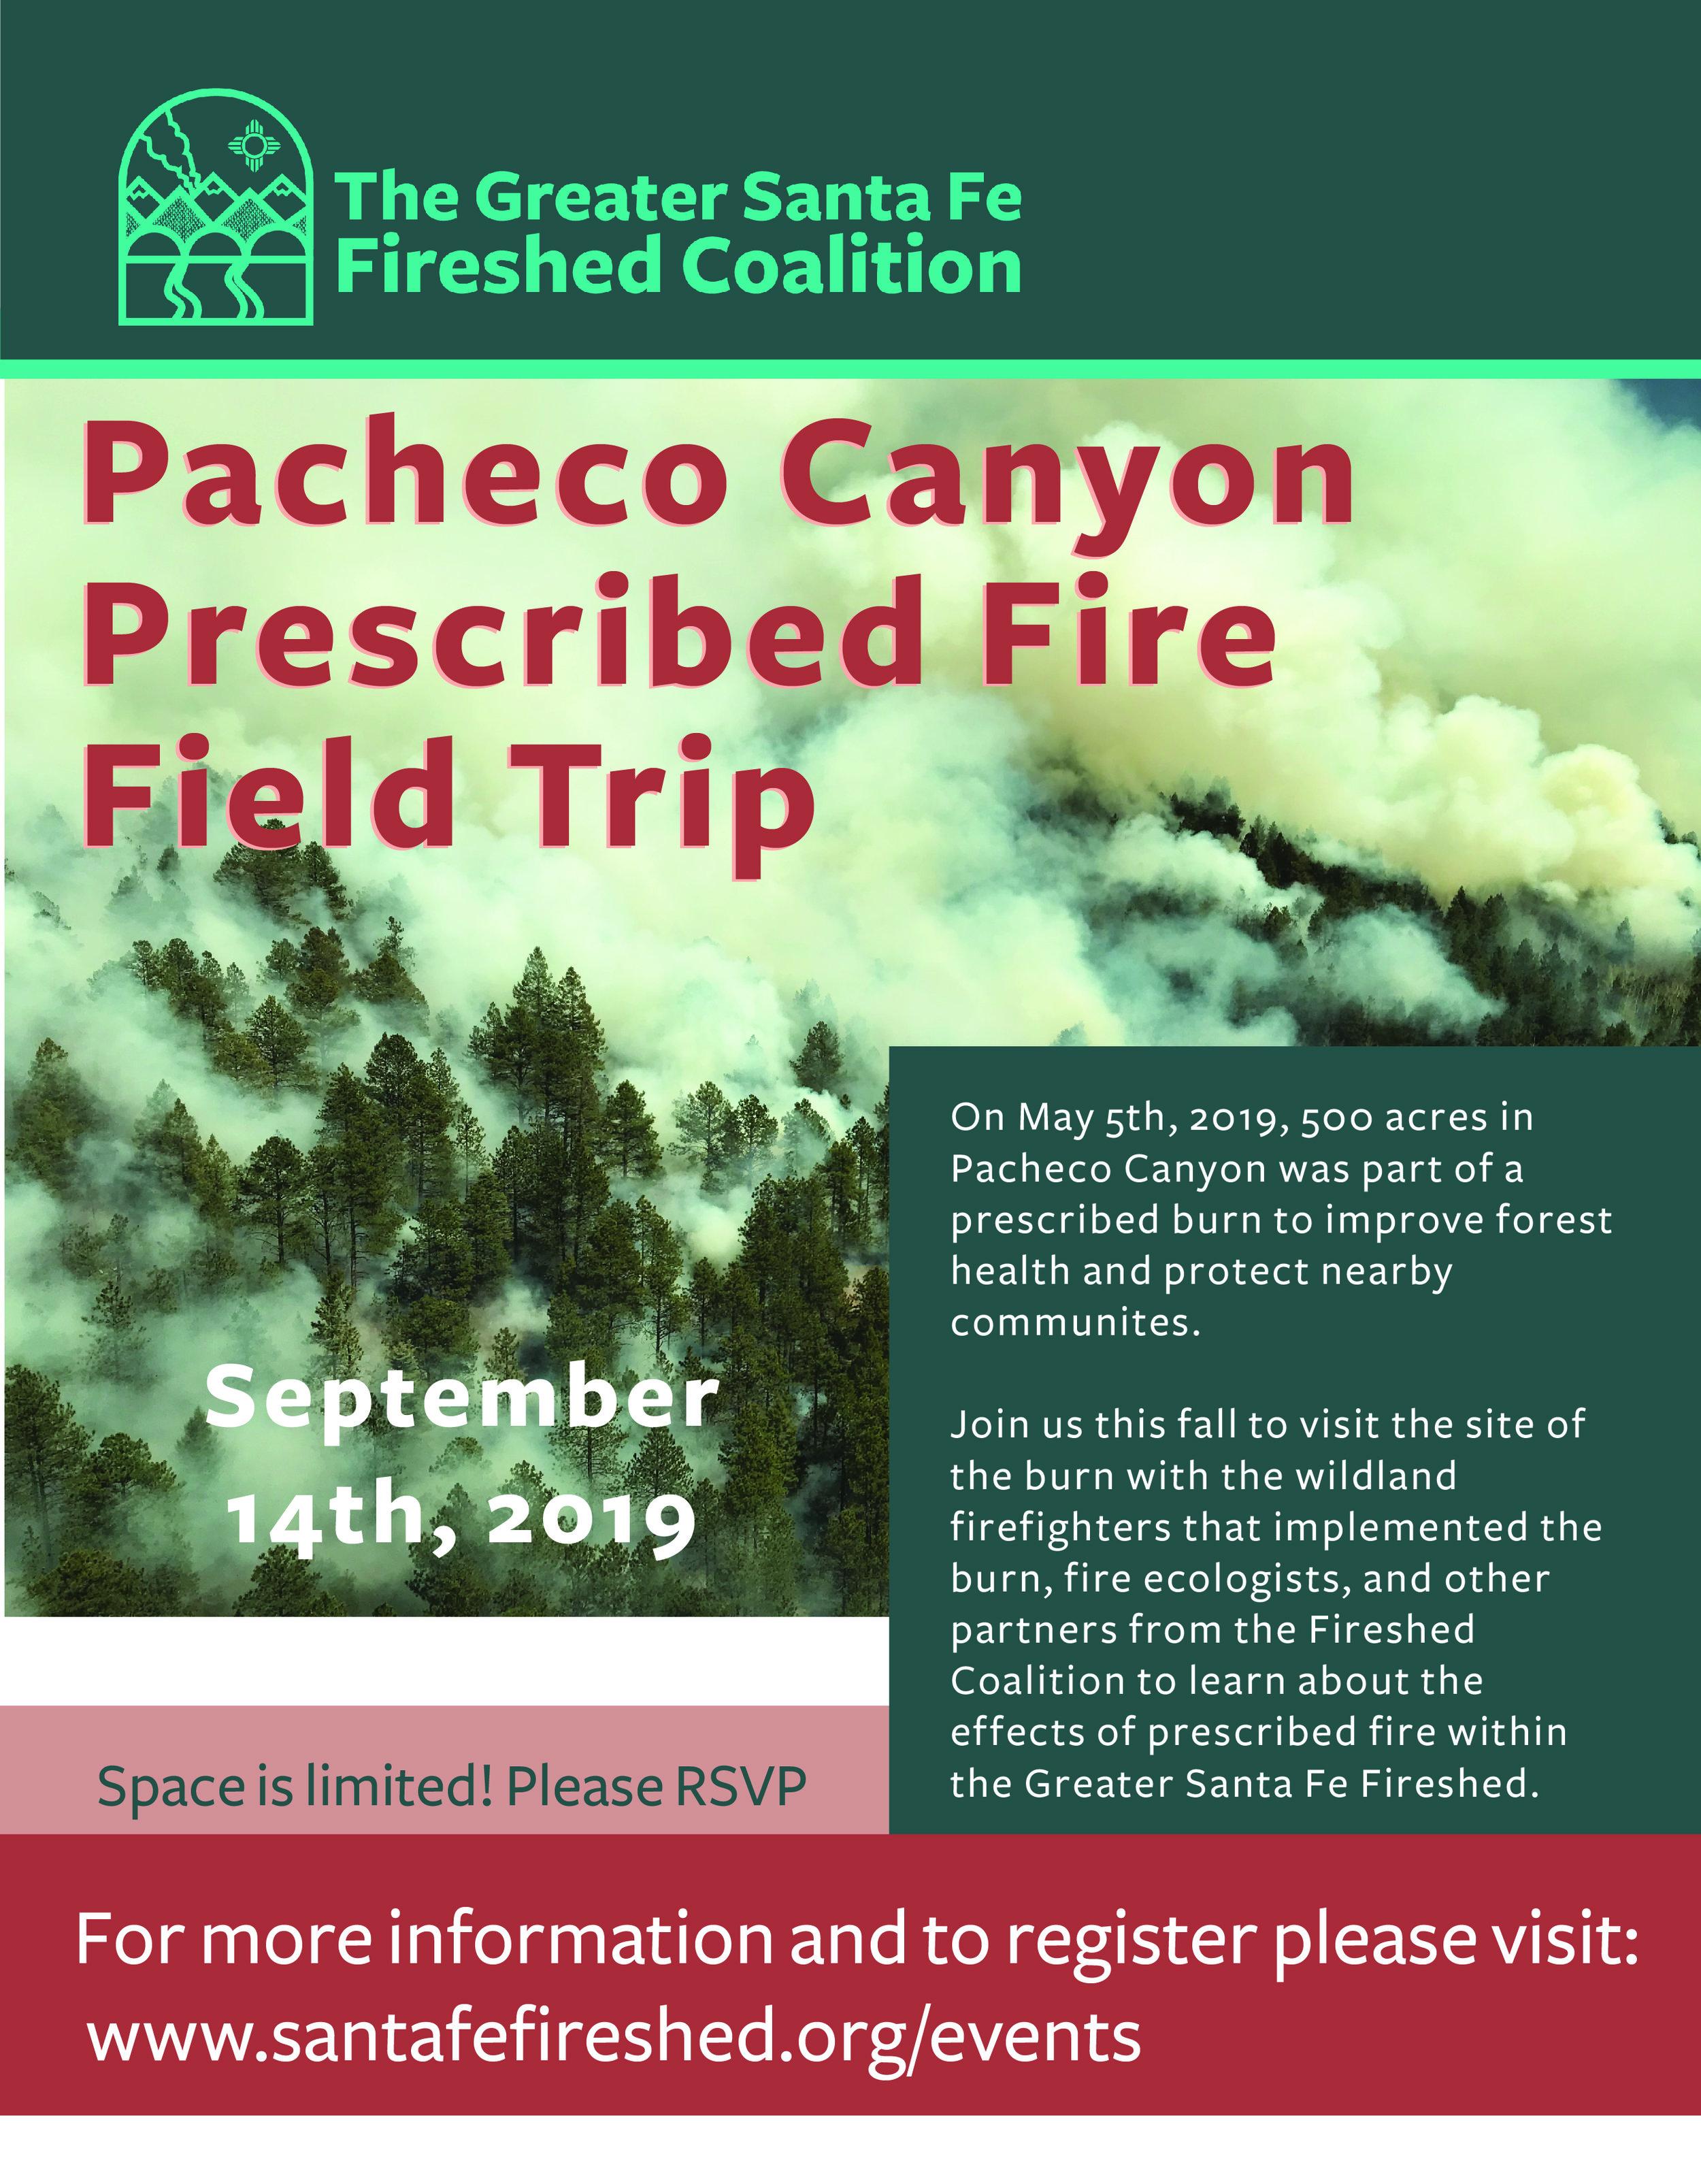 Pacheco Canyon Field Trip Flyer-01.jpg